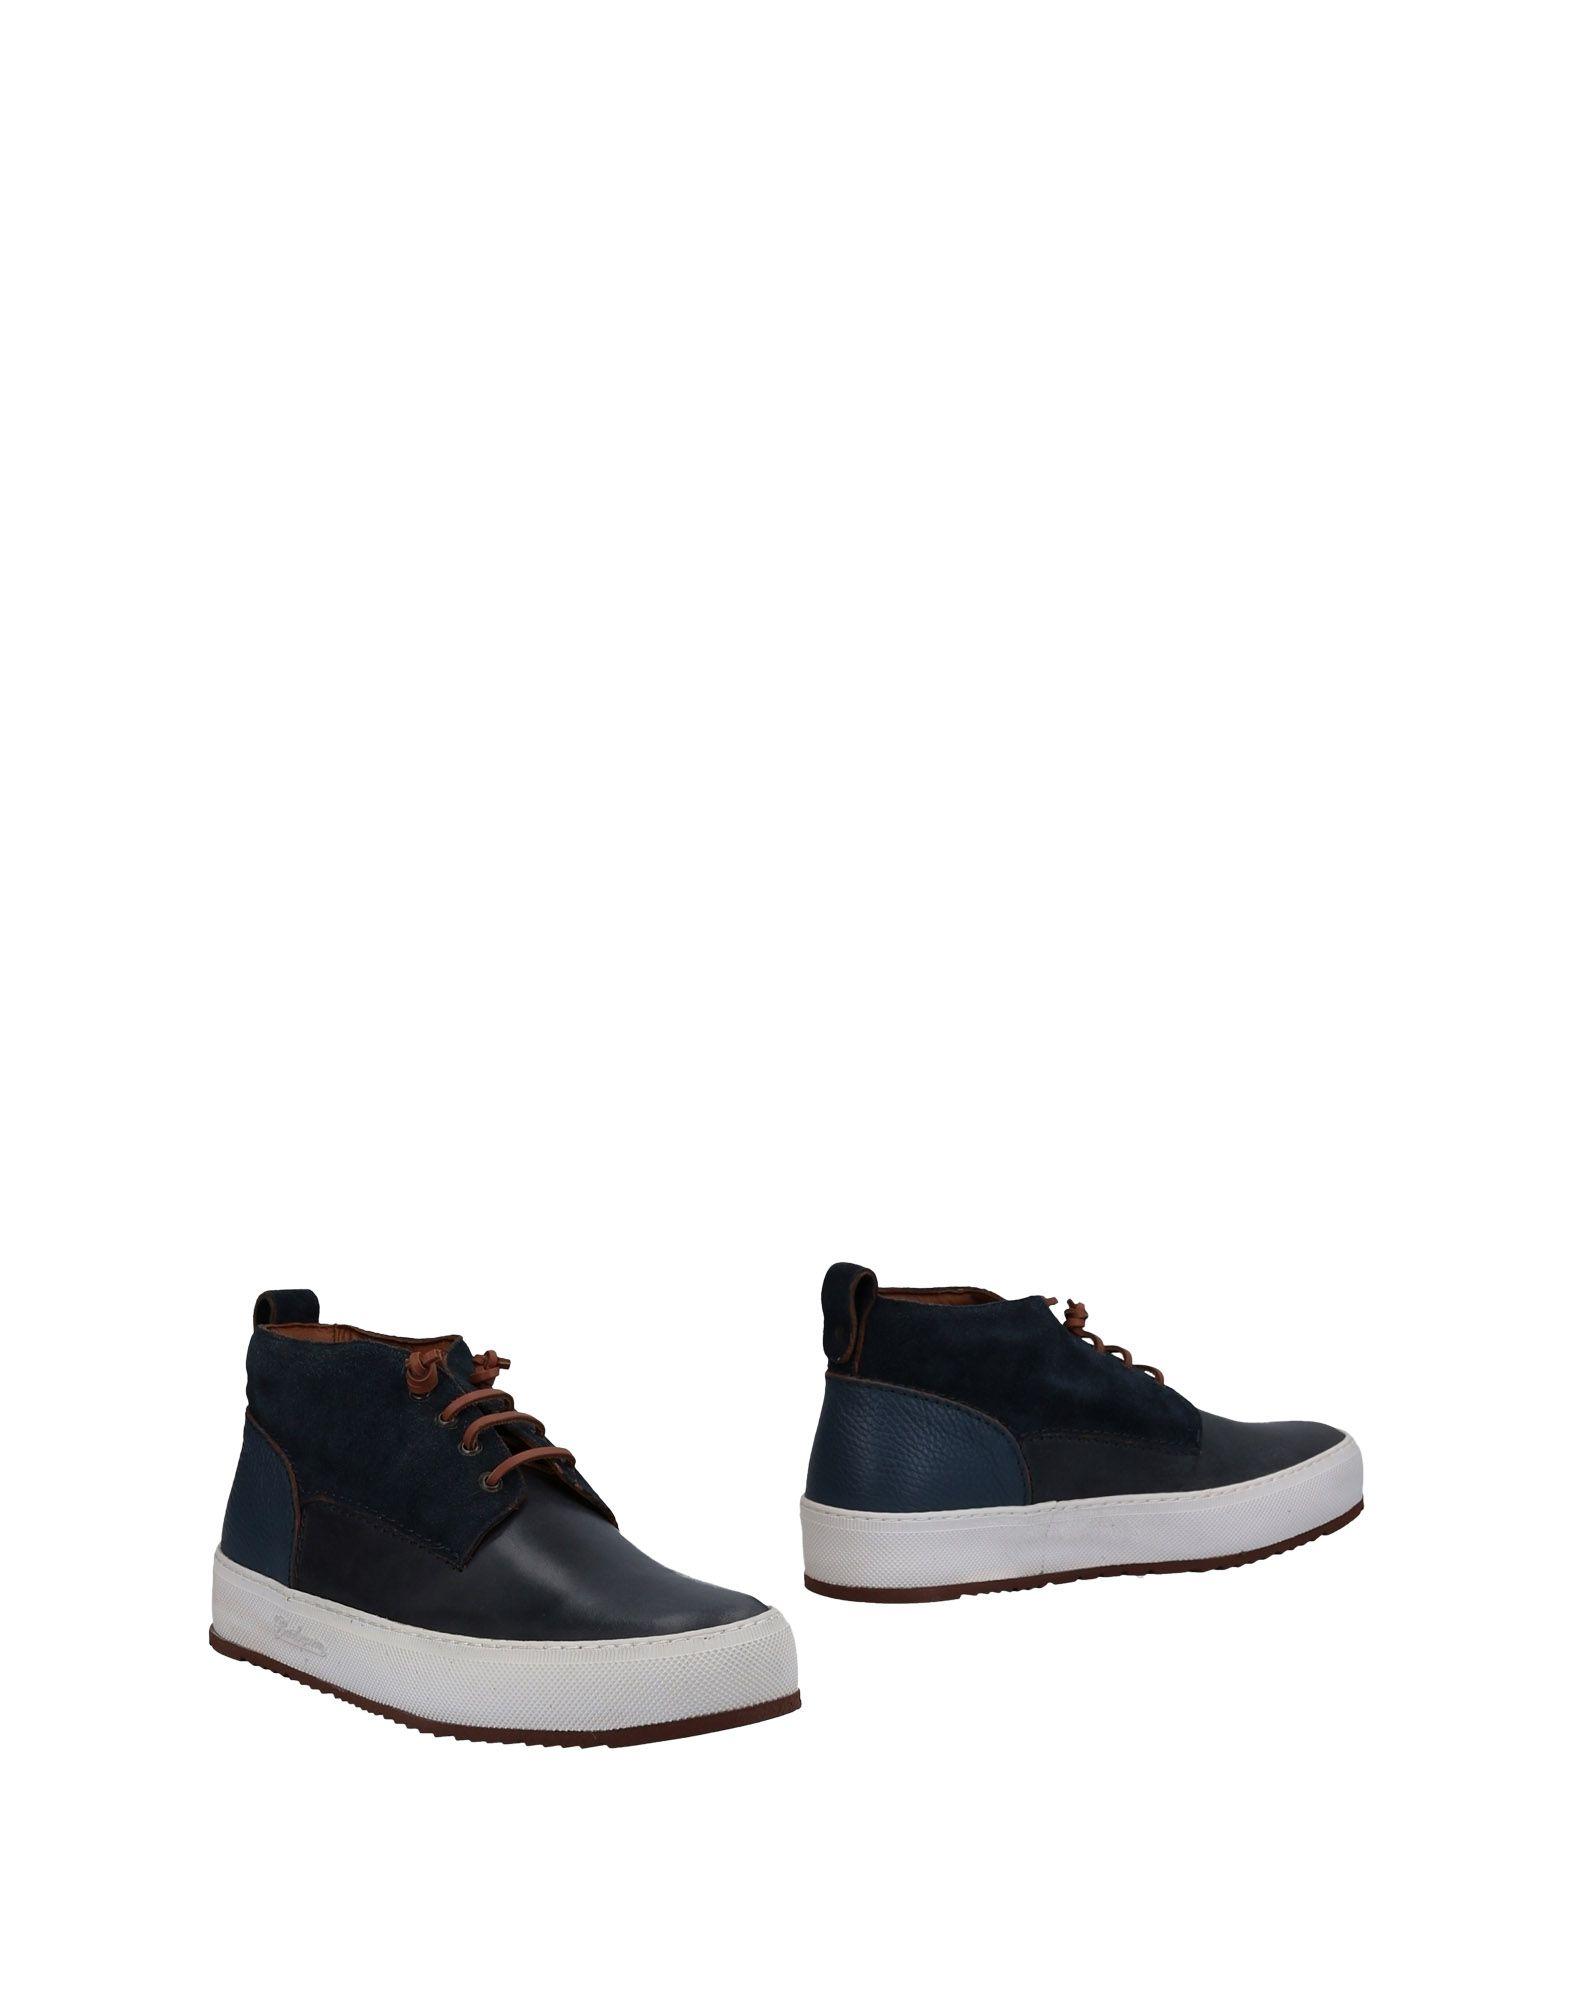 Rabatt echte Schuhe Barleycorn  Stiefelette Herren  Barleycorn 11475086BE 56da4e